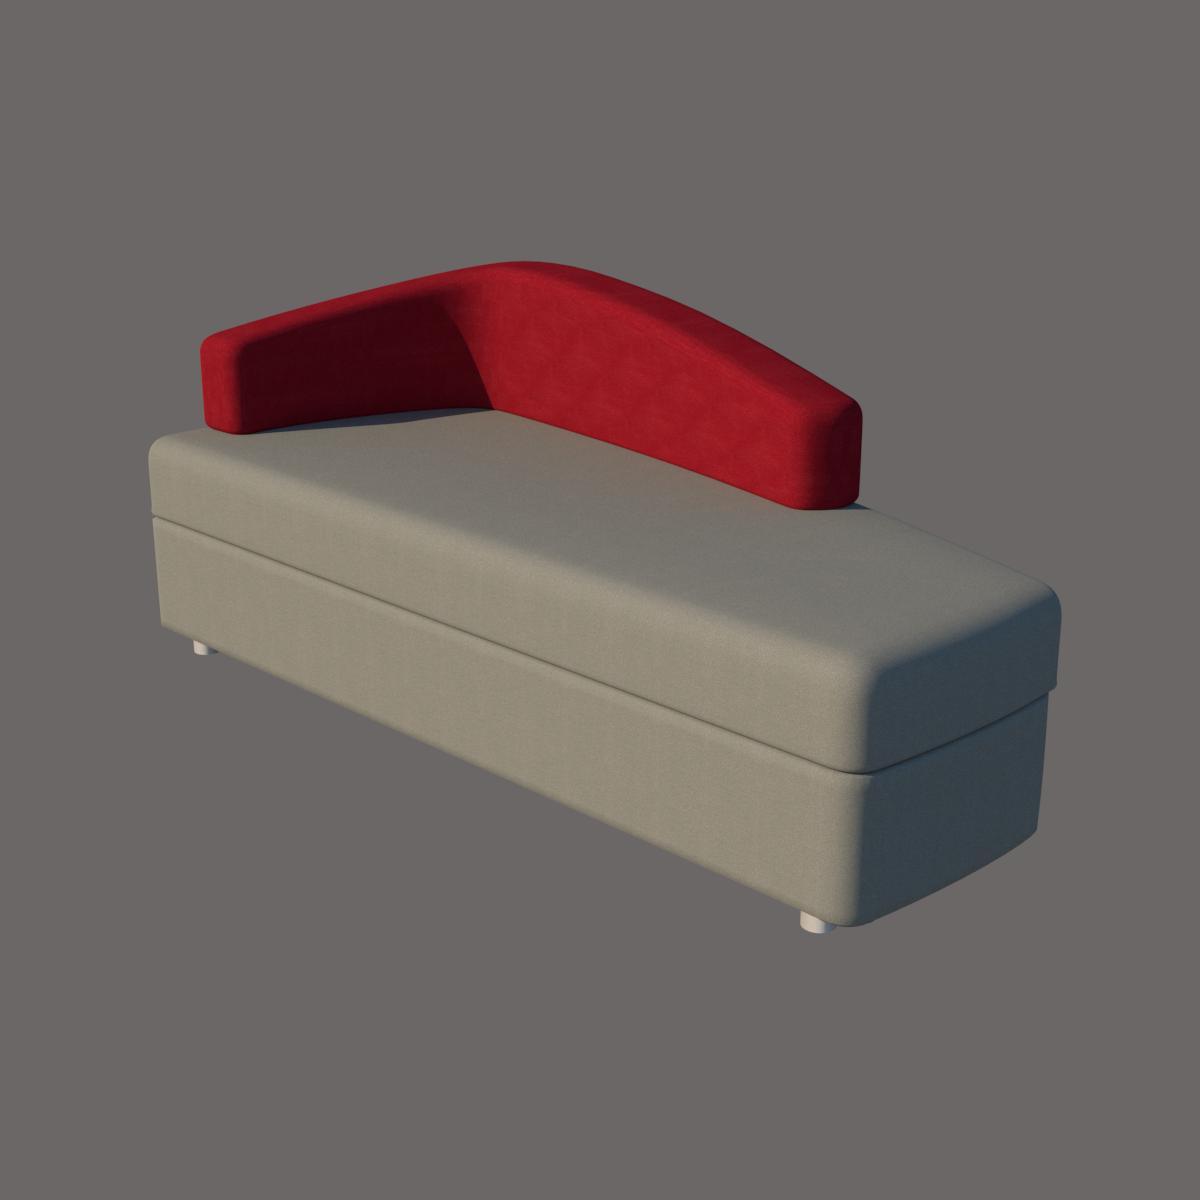 Sofa Long Chaise de línea CHAT de Siel Diseño en BIM